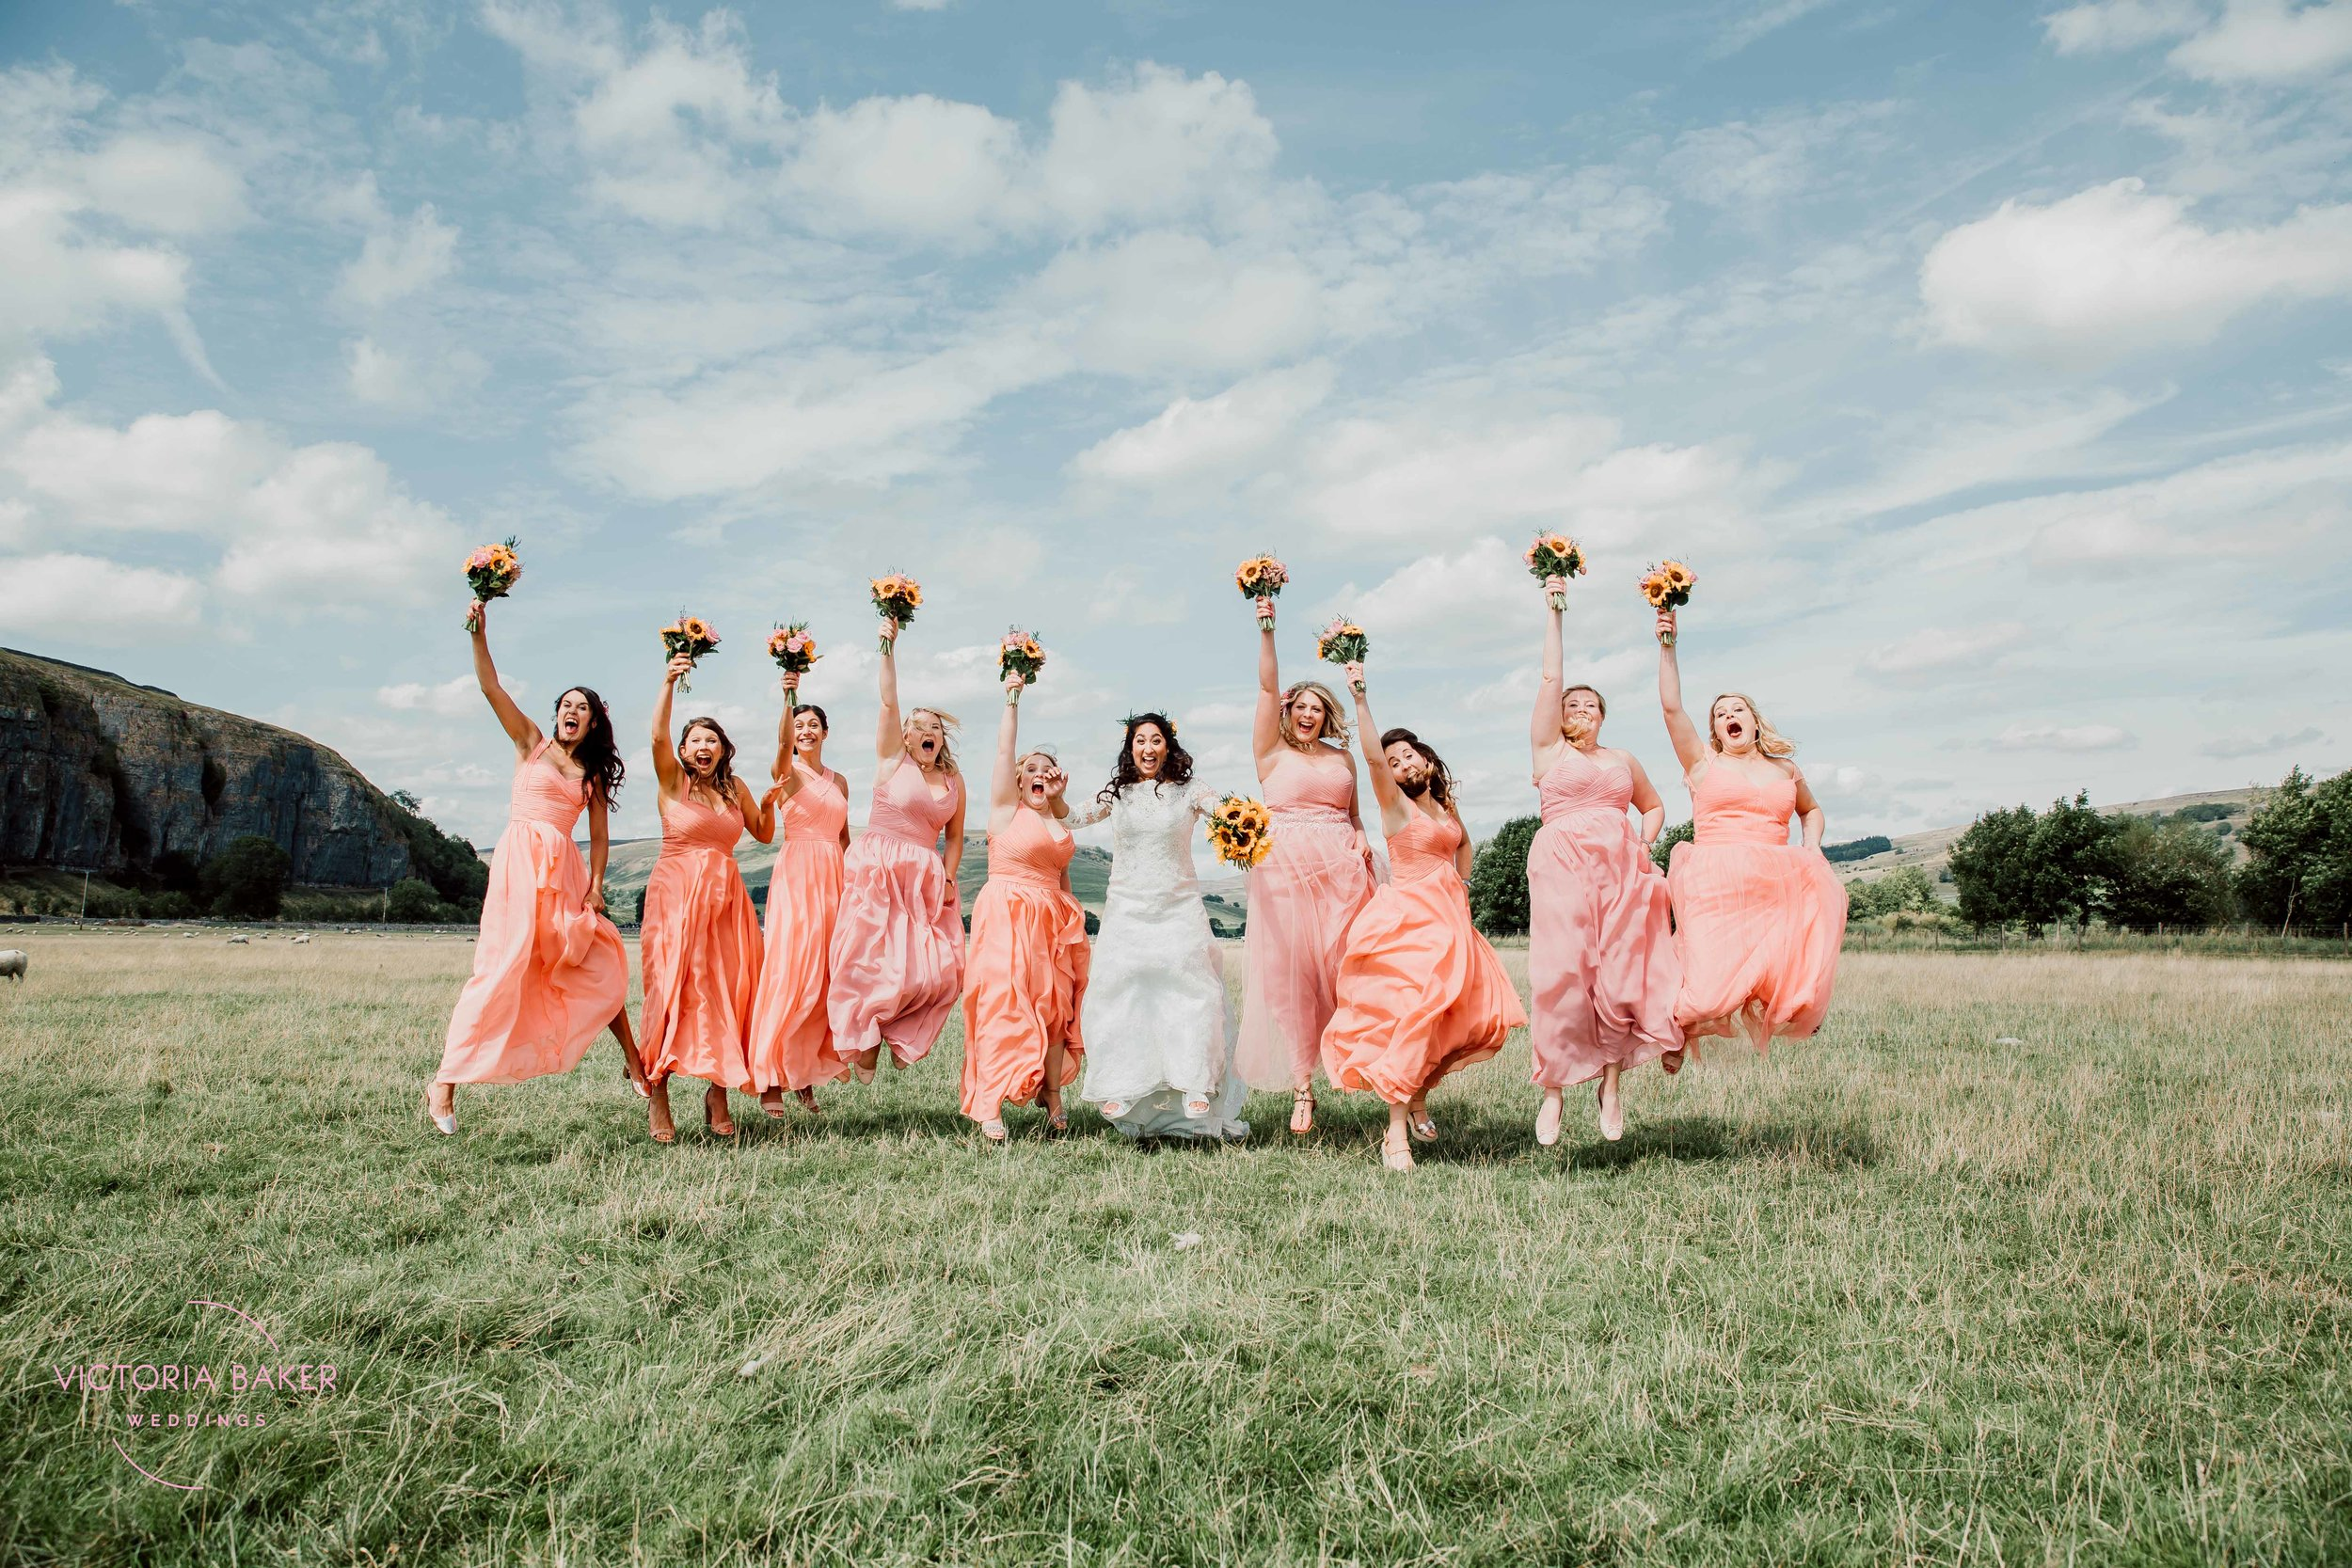 Jumping bridesmaids at Kilnsey Park Estate